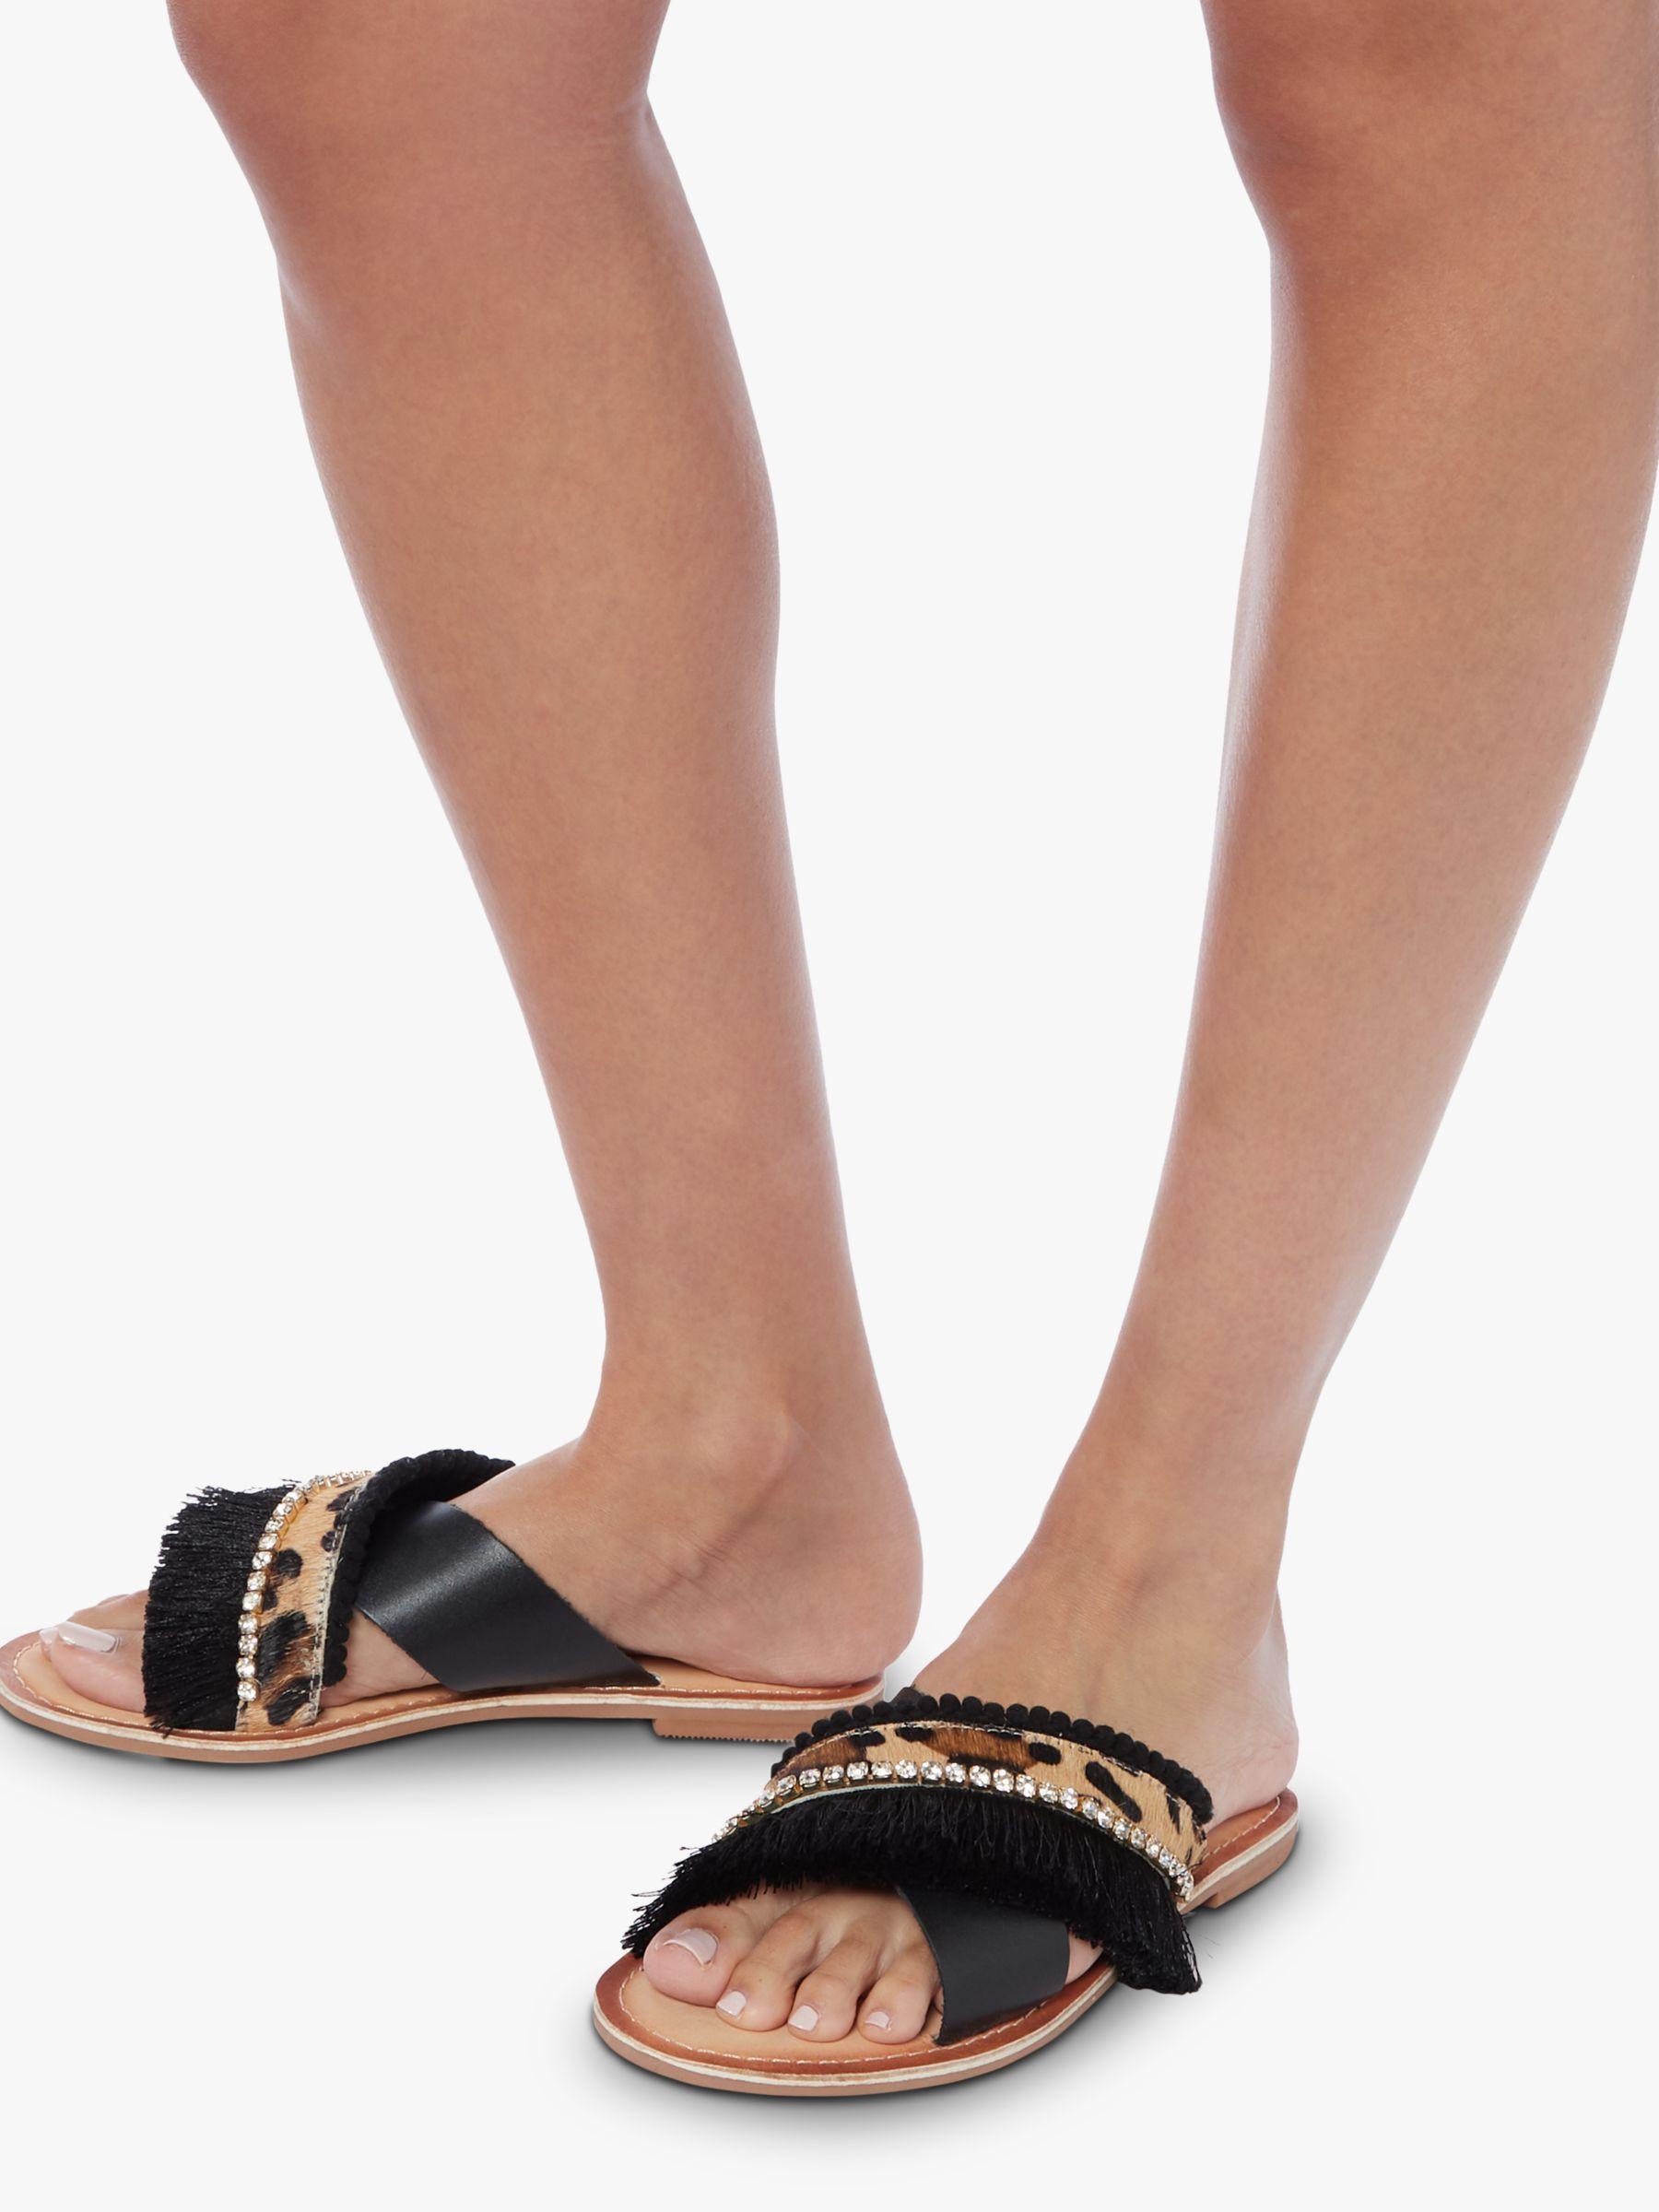 00c0249d90f Dune Lumos Fringe Detail Slider Sandals in Black - Lyst